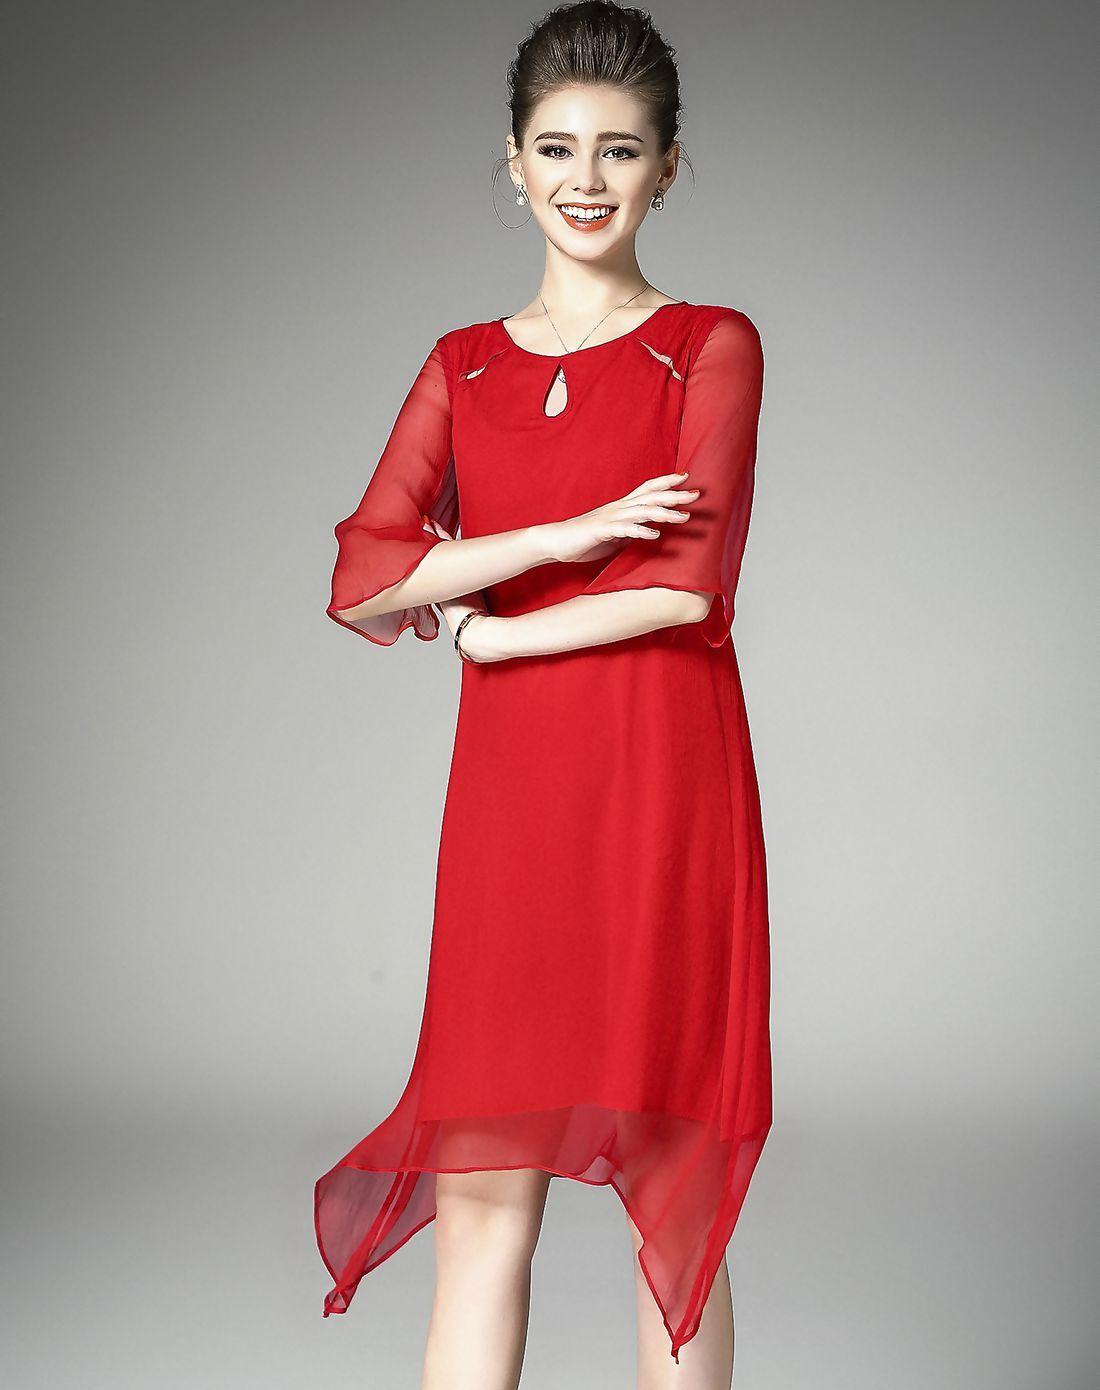 Adorewe vipme swing dressesdesigner elenyun red bell sleeve